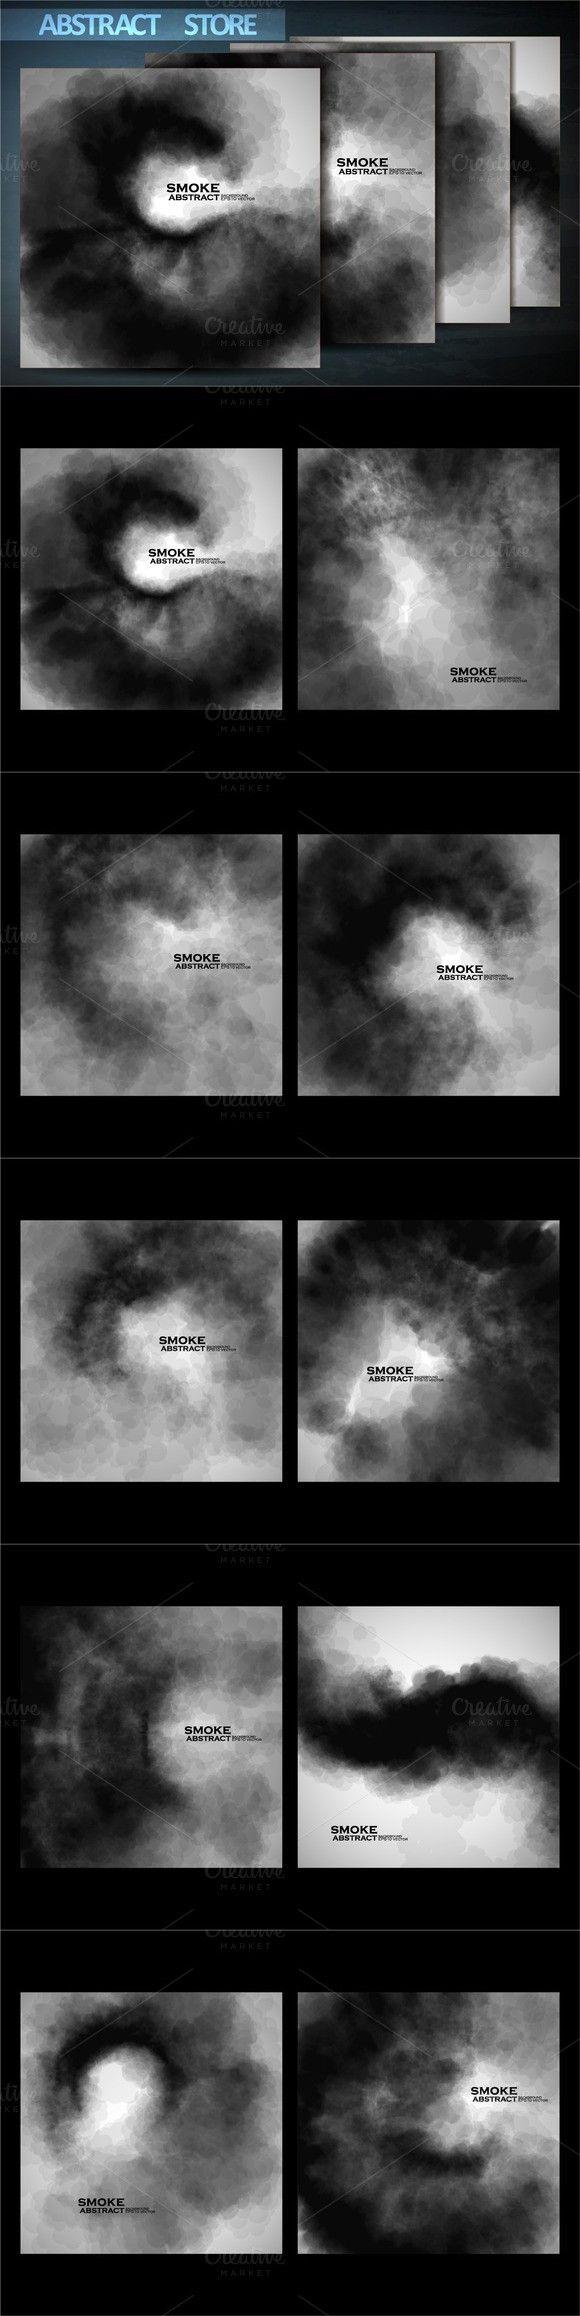 Smoke vector backgrounds. Textures. $3.00